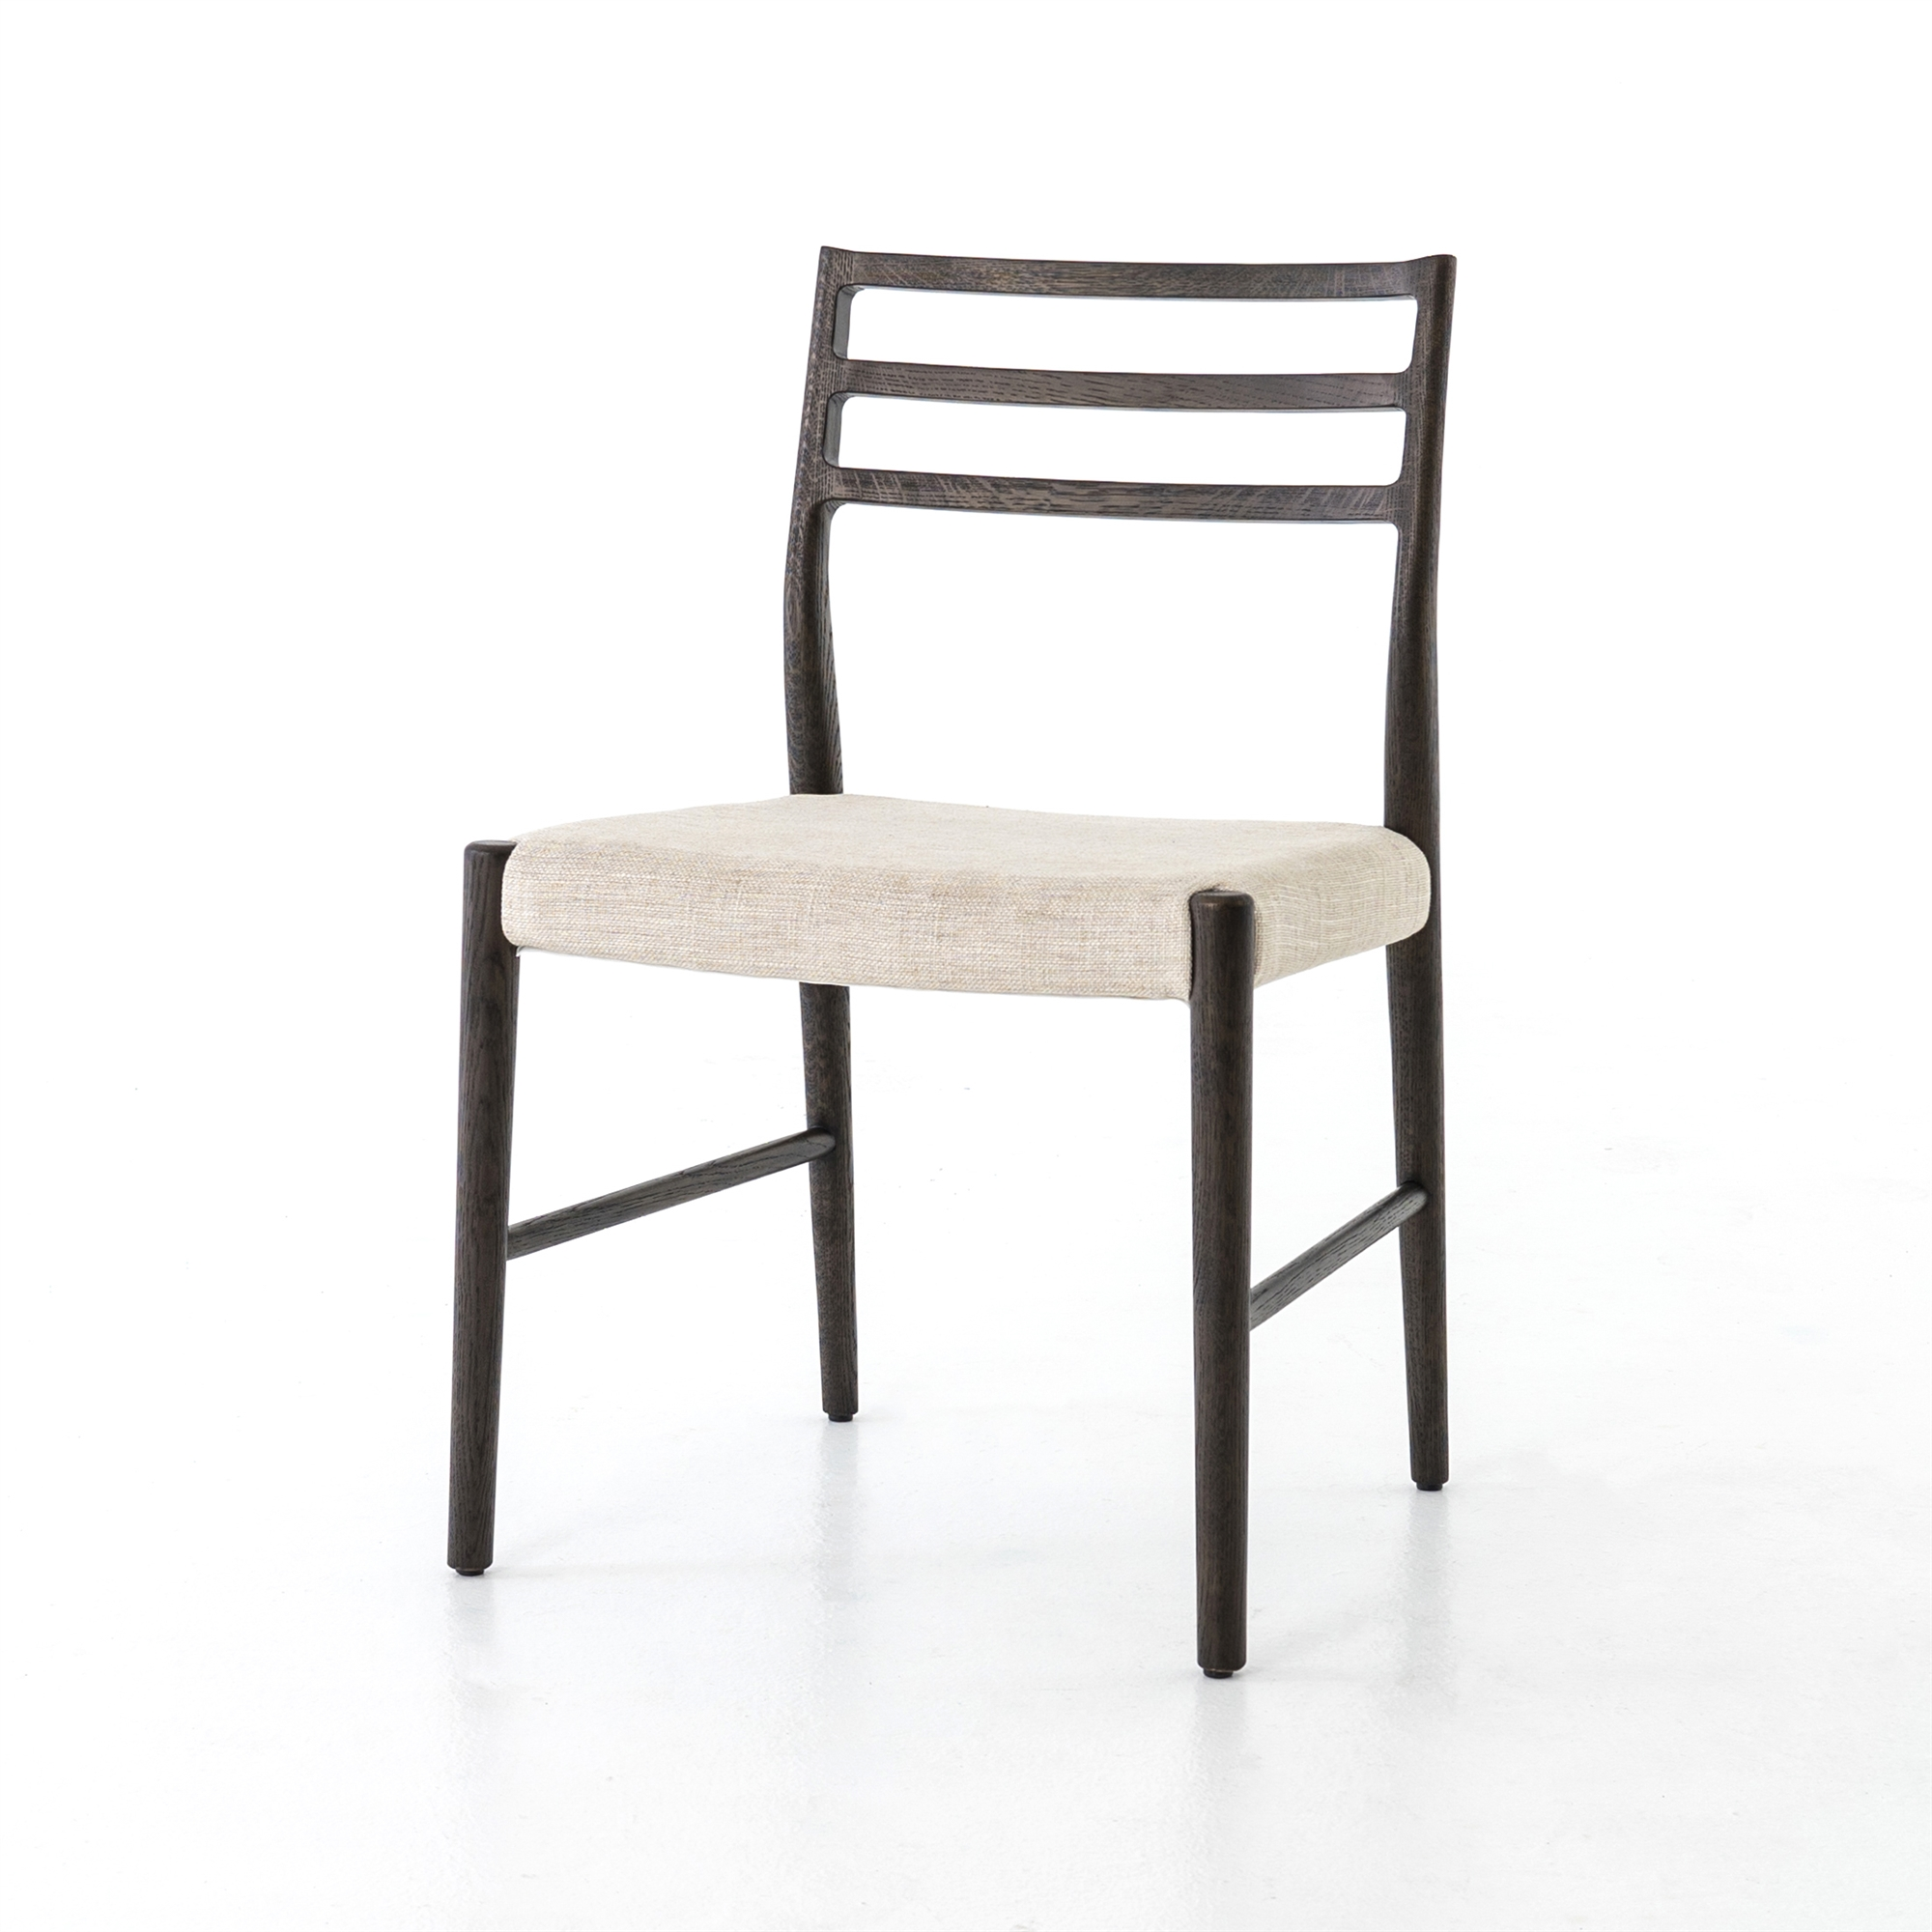 Glenmore dining chair the khazana home austin furniture store